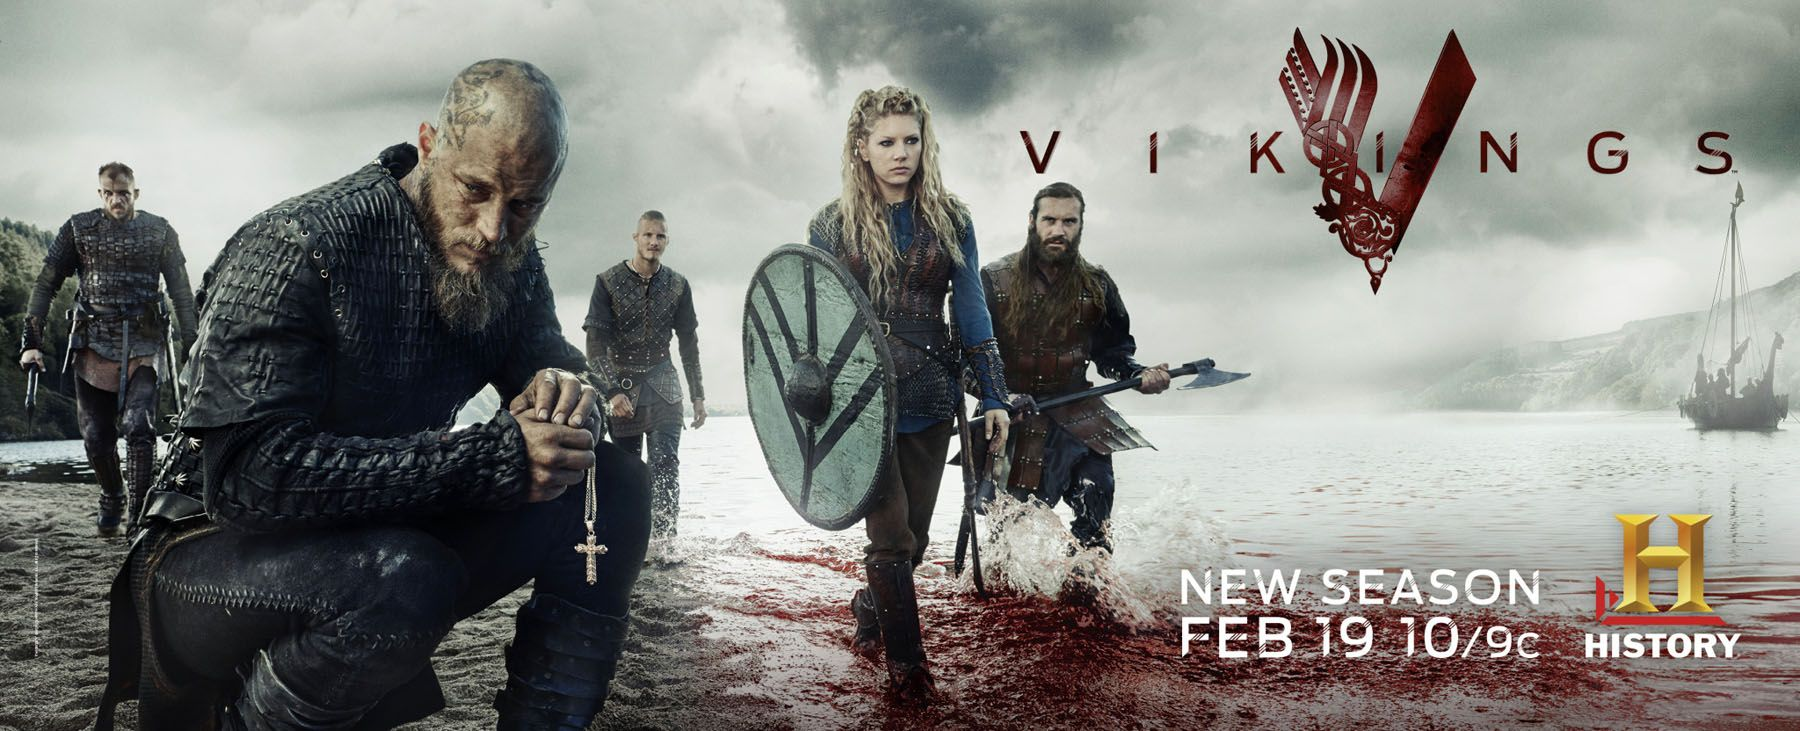 Burning Series Vikings 3